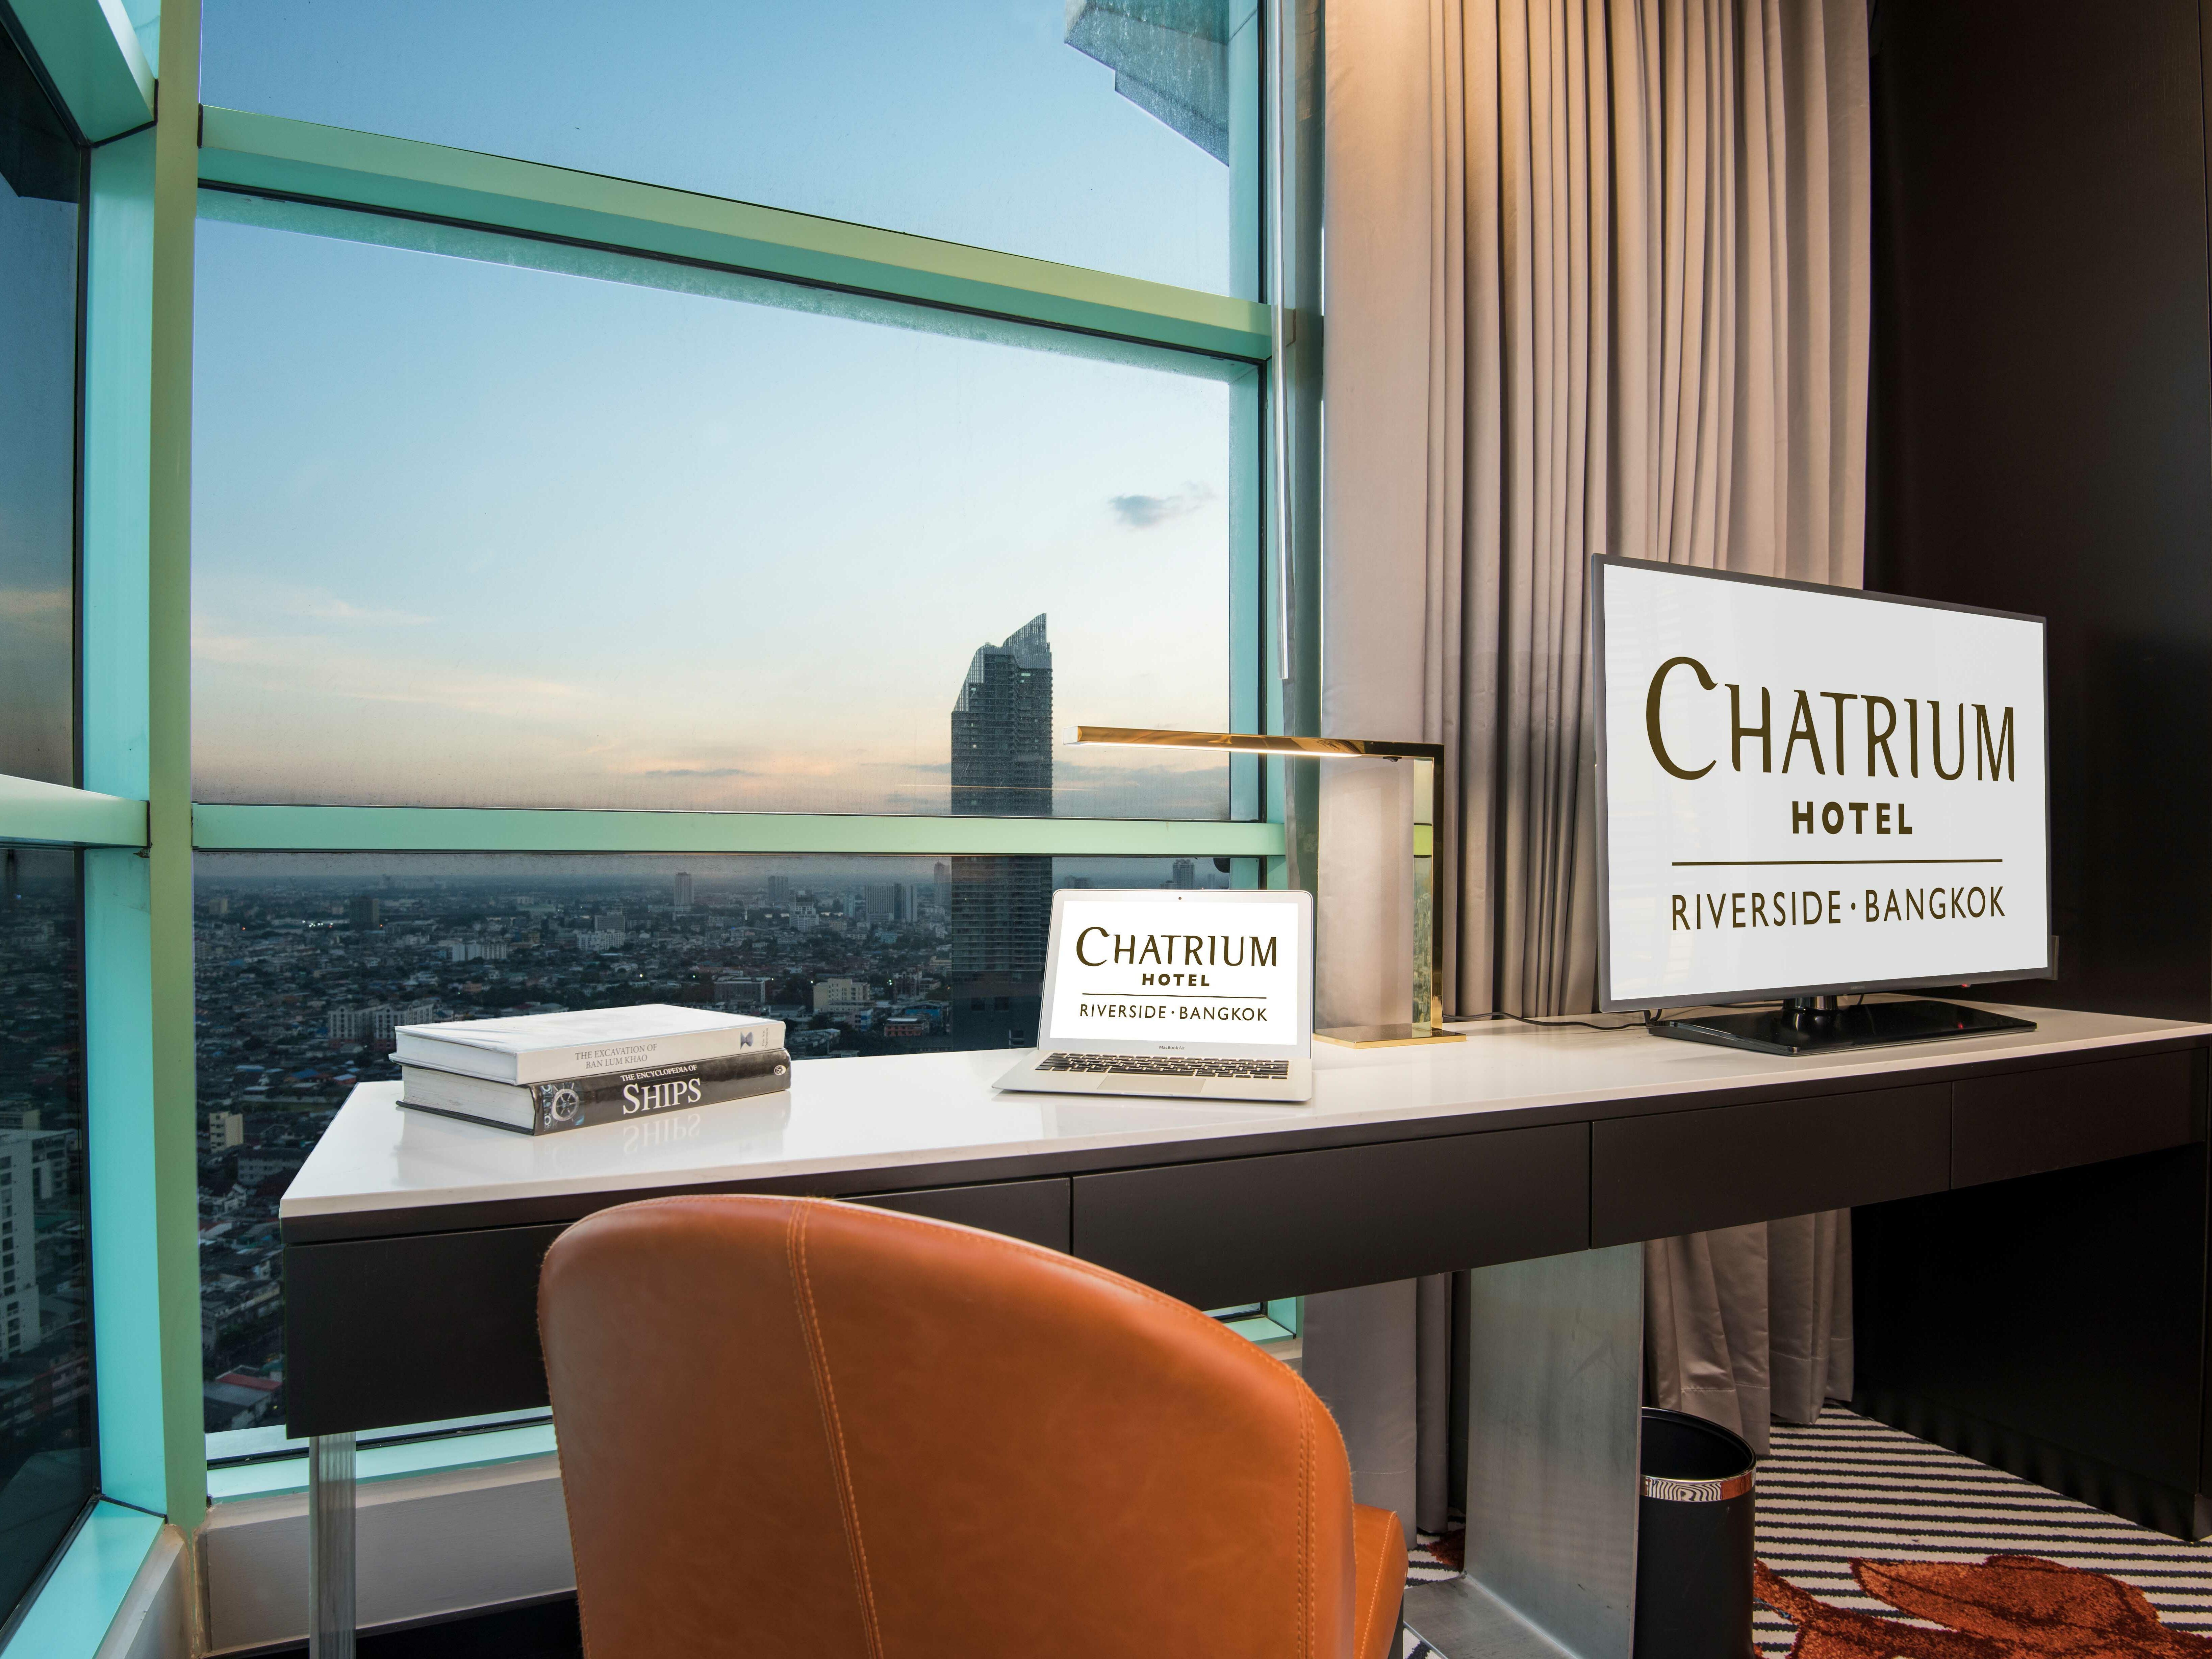 Chatrium Club Suite One Bedroom City View at Chatrium Hotel Riverside Bangkok